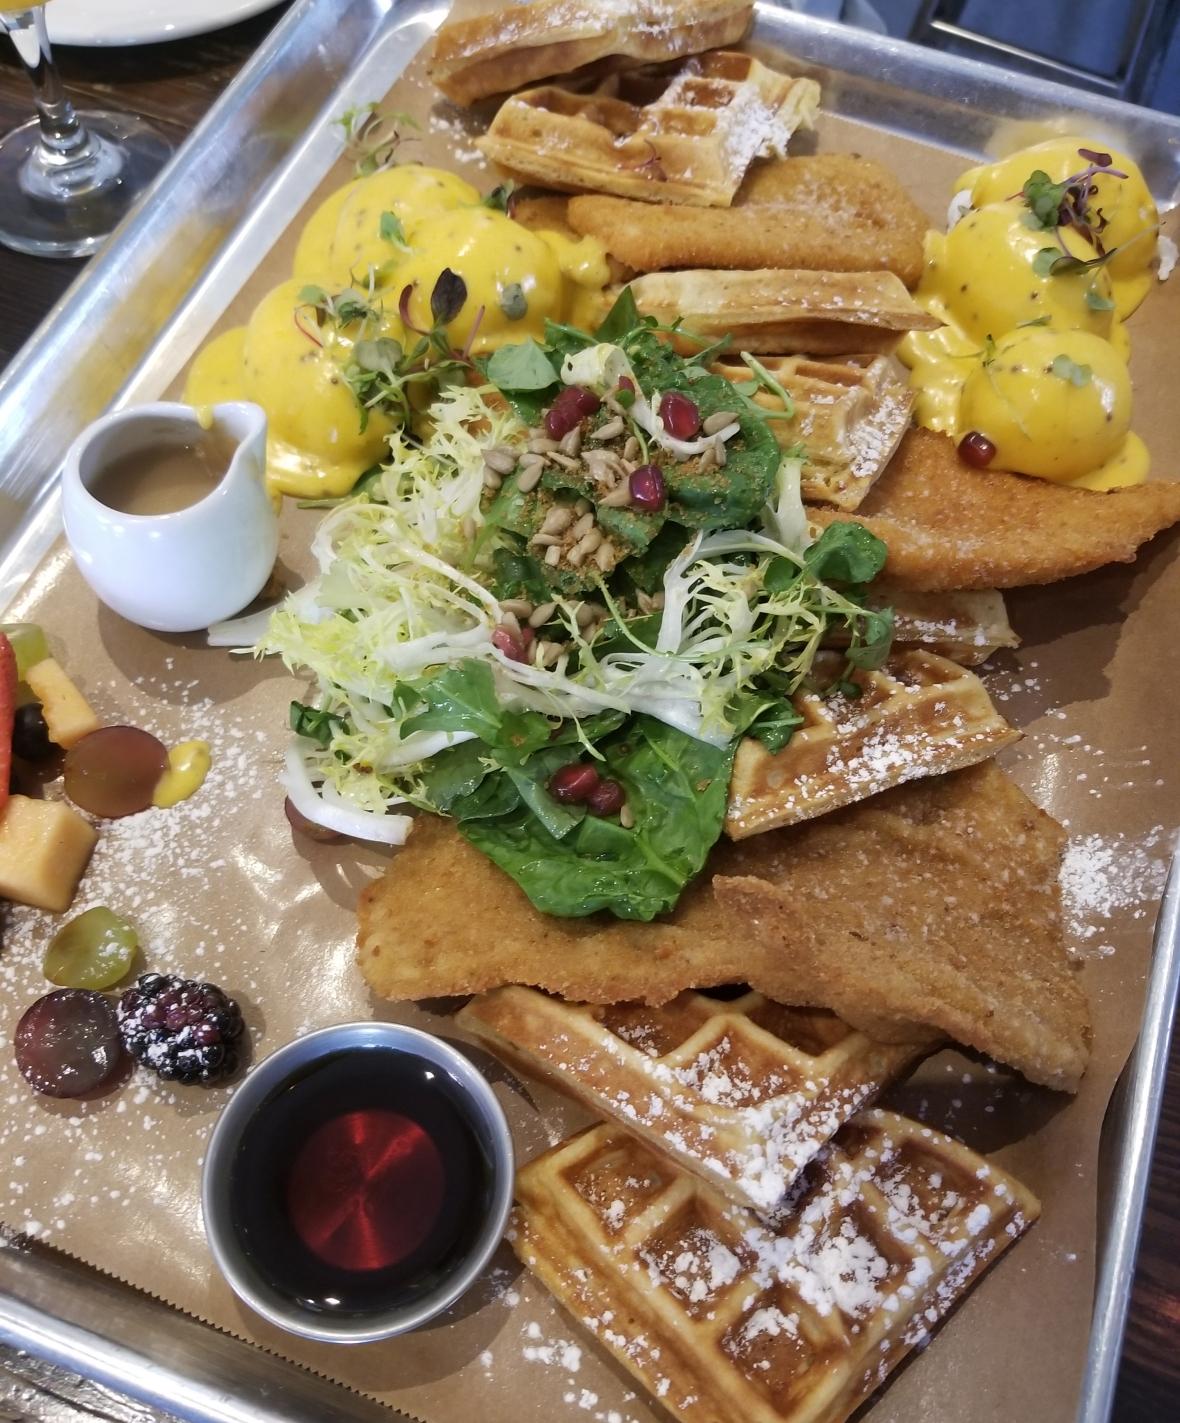 Schnitzel and Waffle Brunch Platter